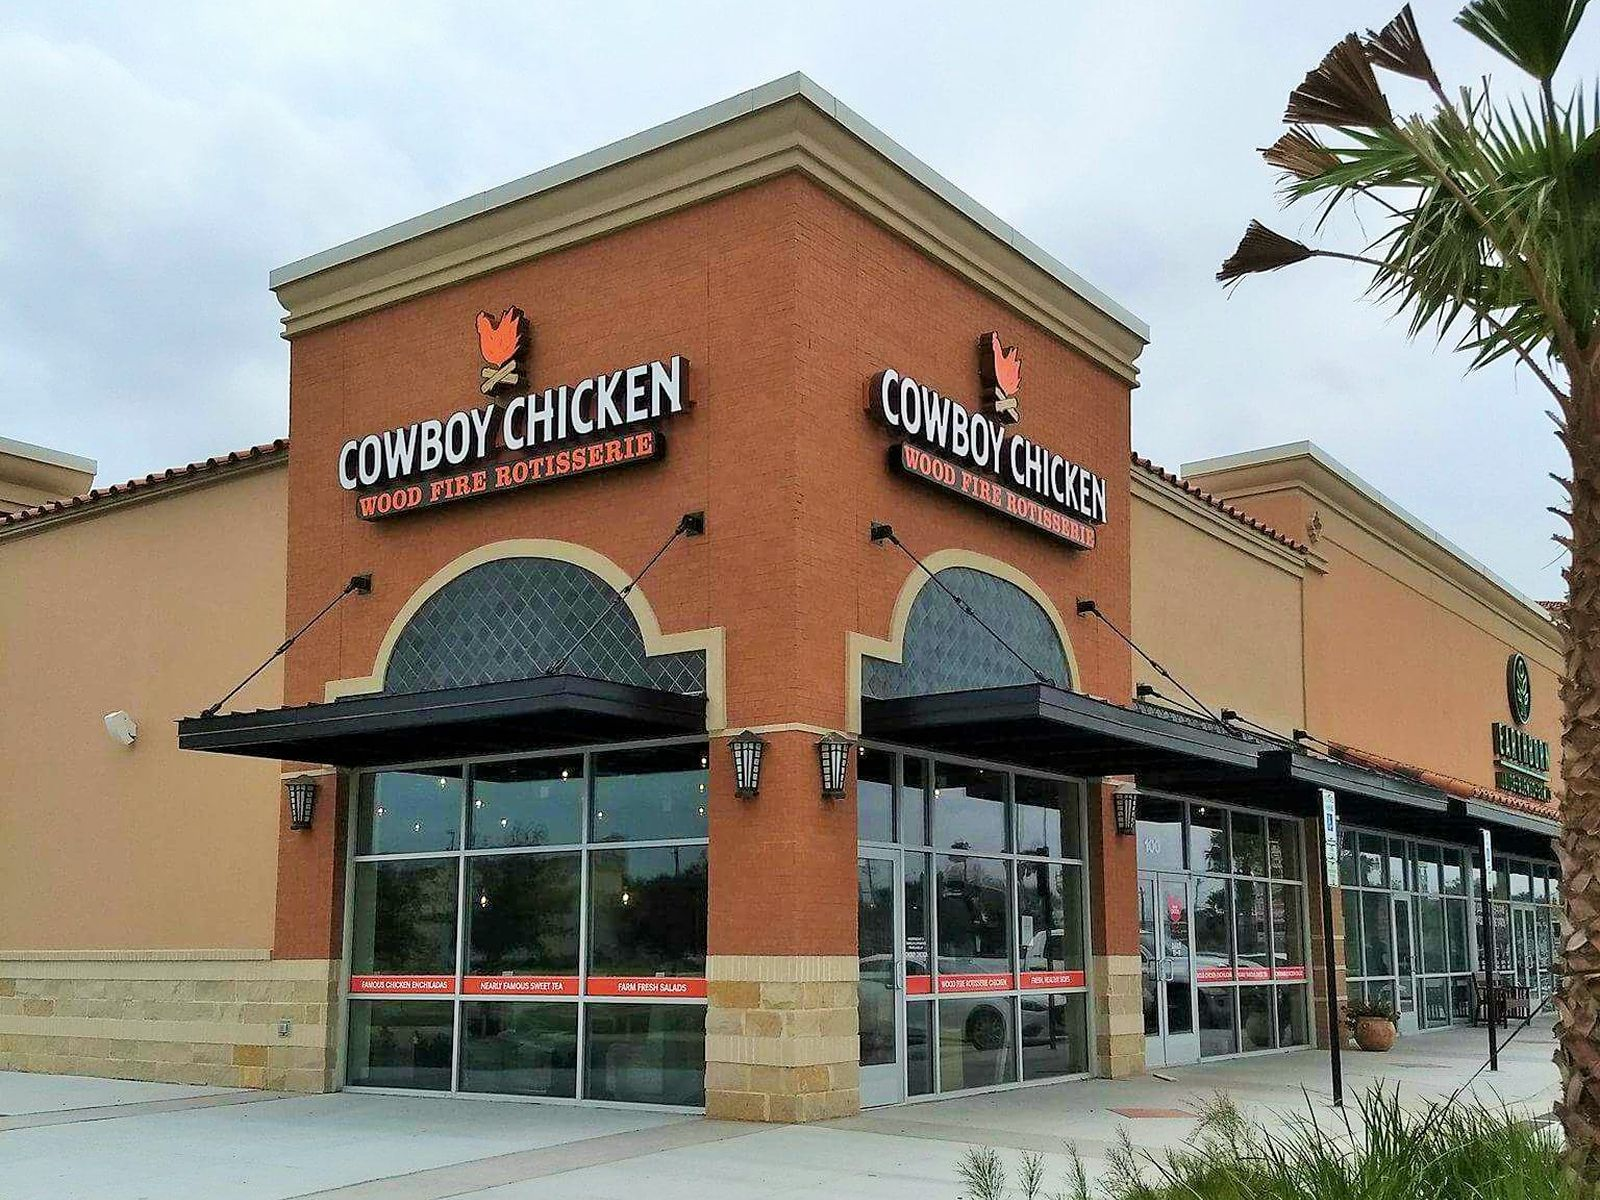 Cowboy Chicken in McAllen's Palms Crossing Shopping Center Hosts Weeklong Grand Opening Celebration March 26-30